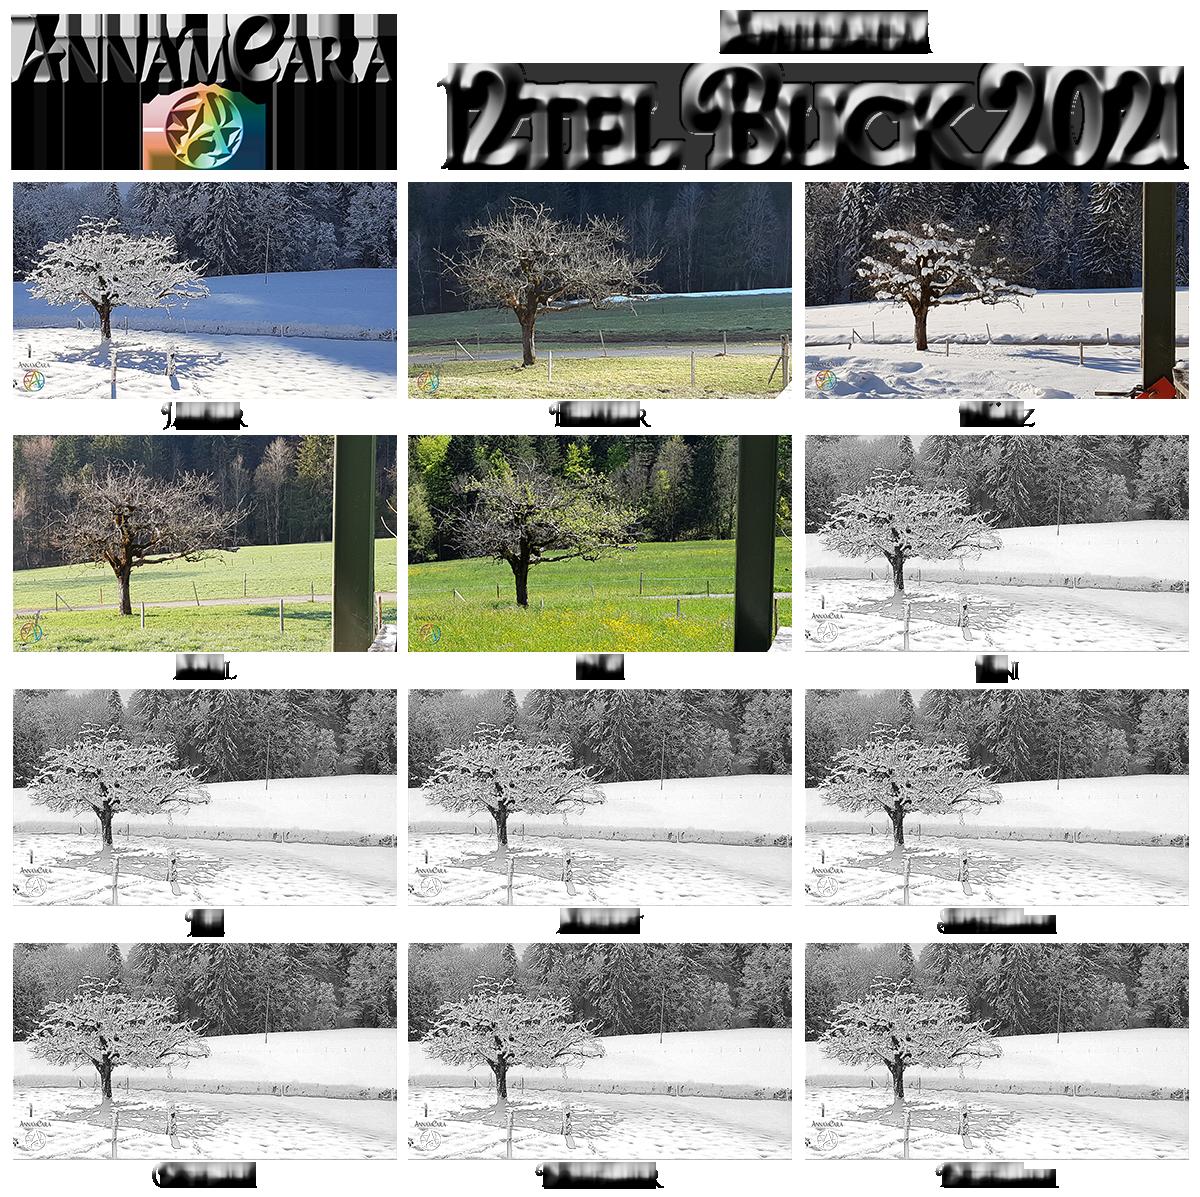 Anna'mCara-Blog - 12tel-Blick - Jahresblick - Mai - Apfelbaum